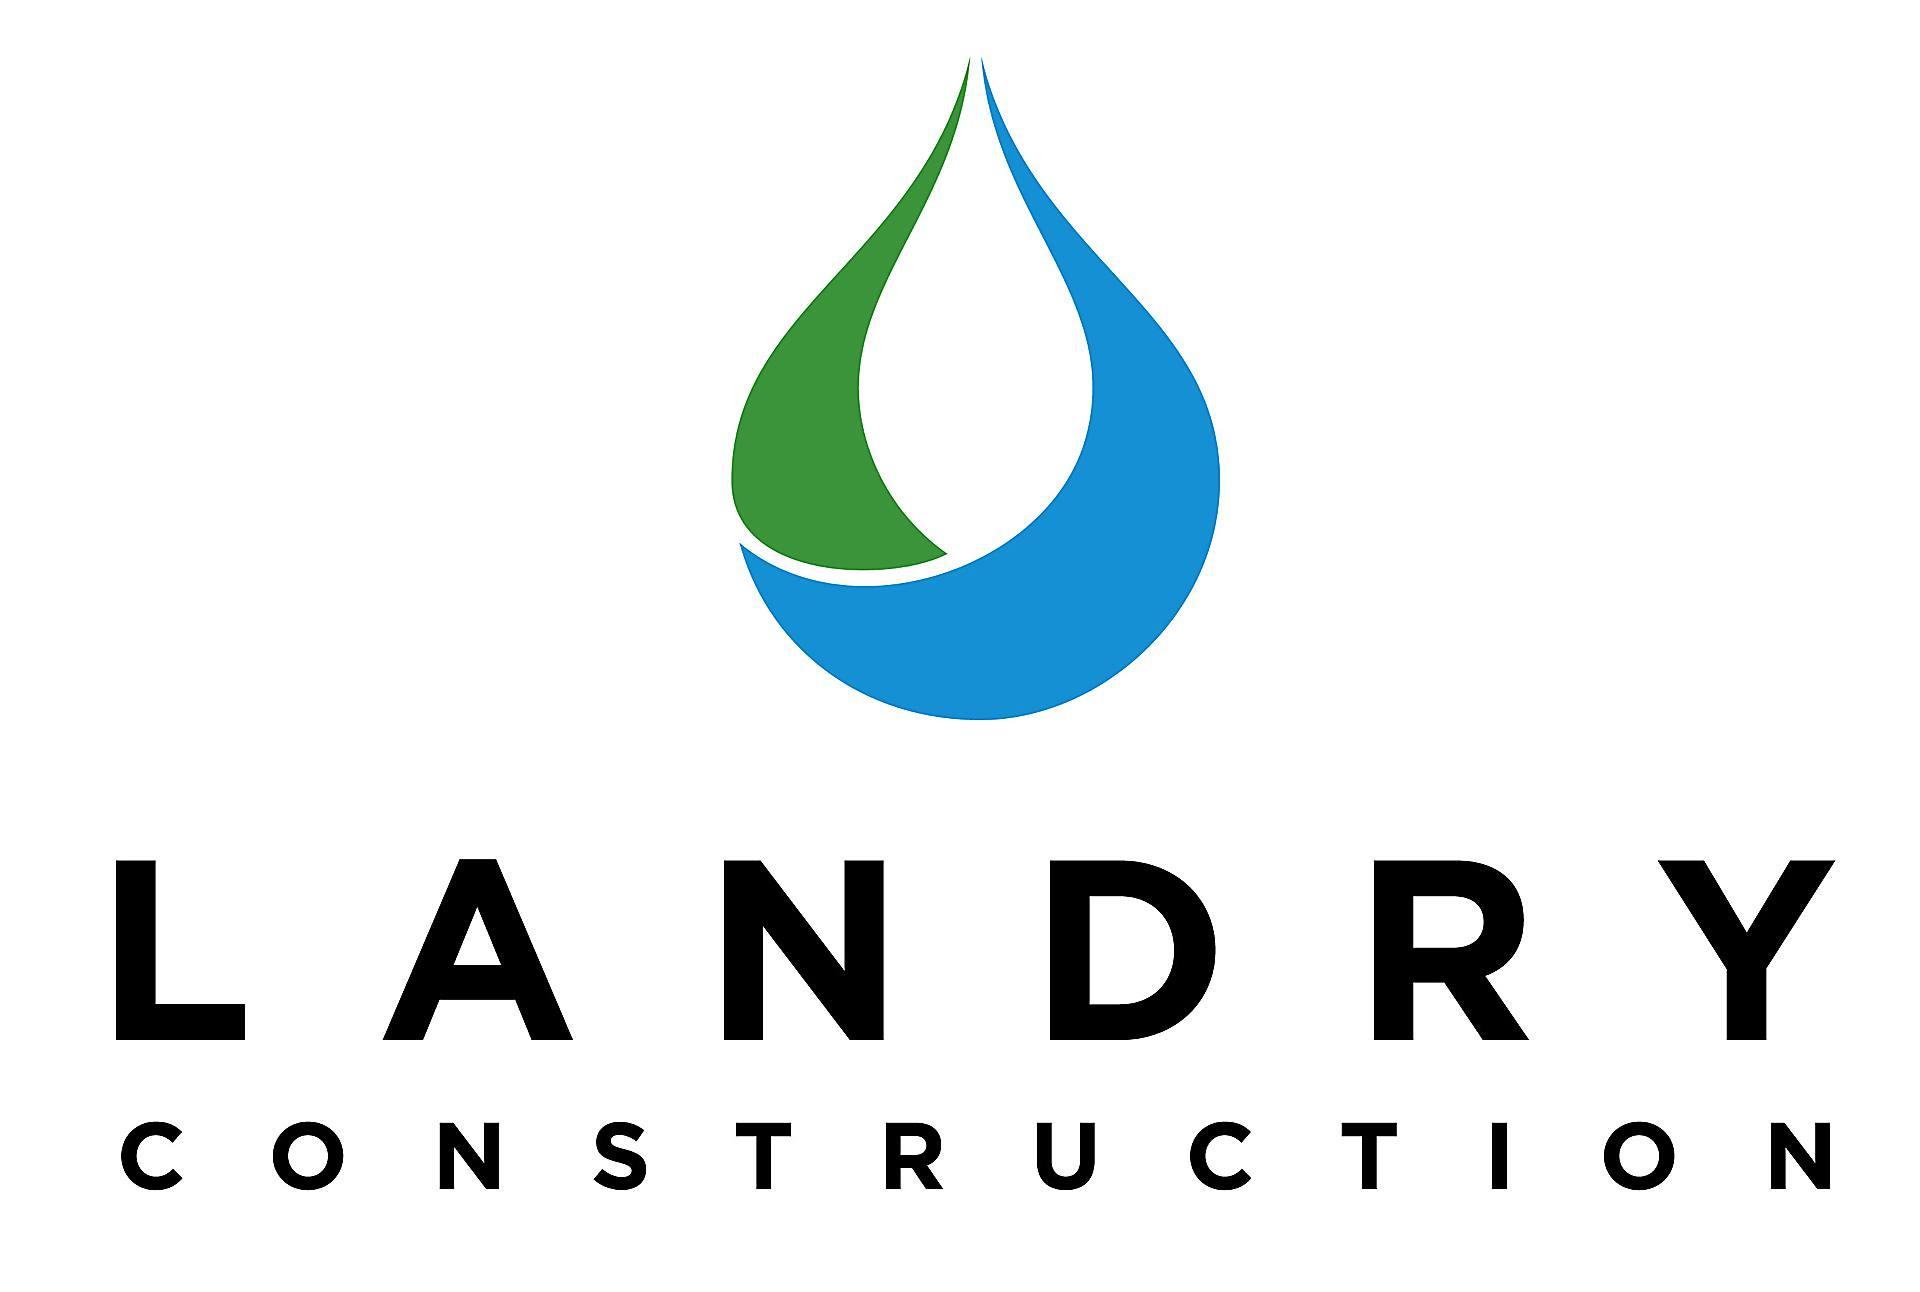 Landry Construction logo